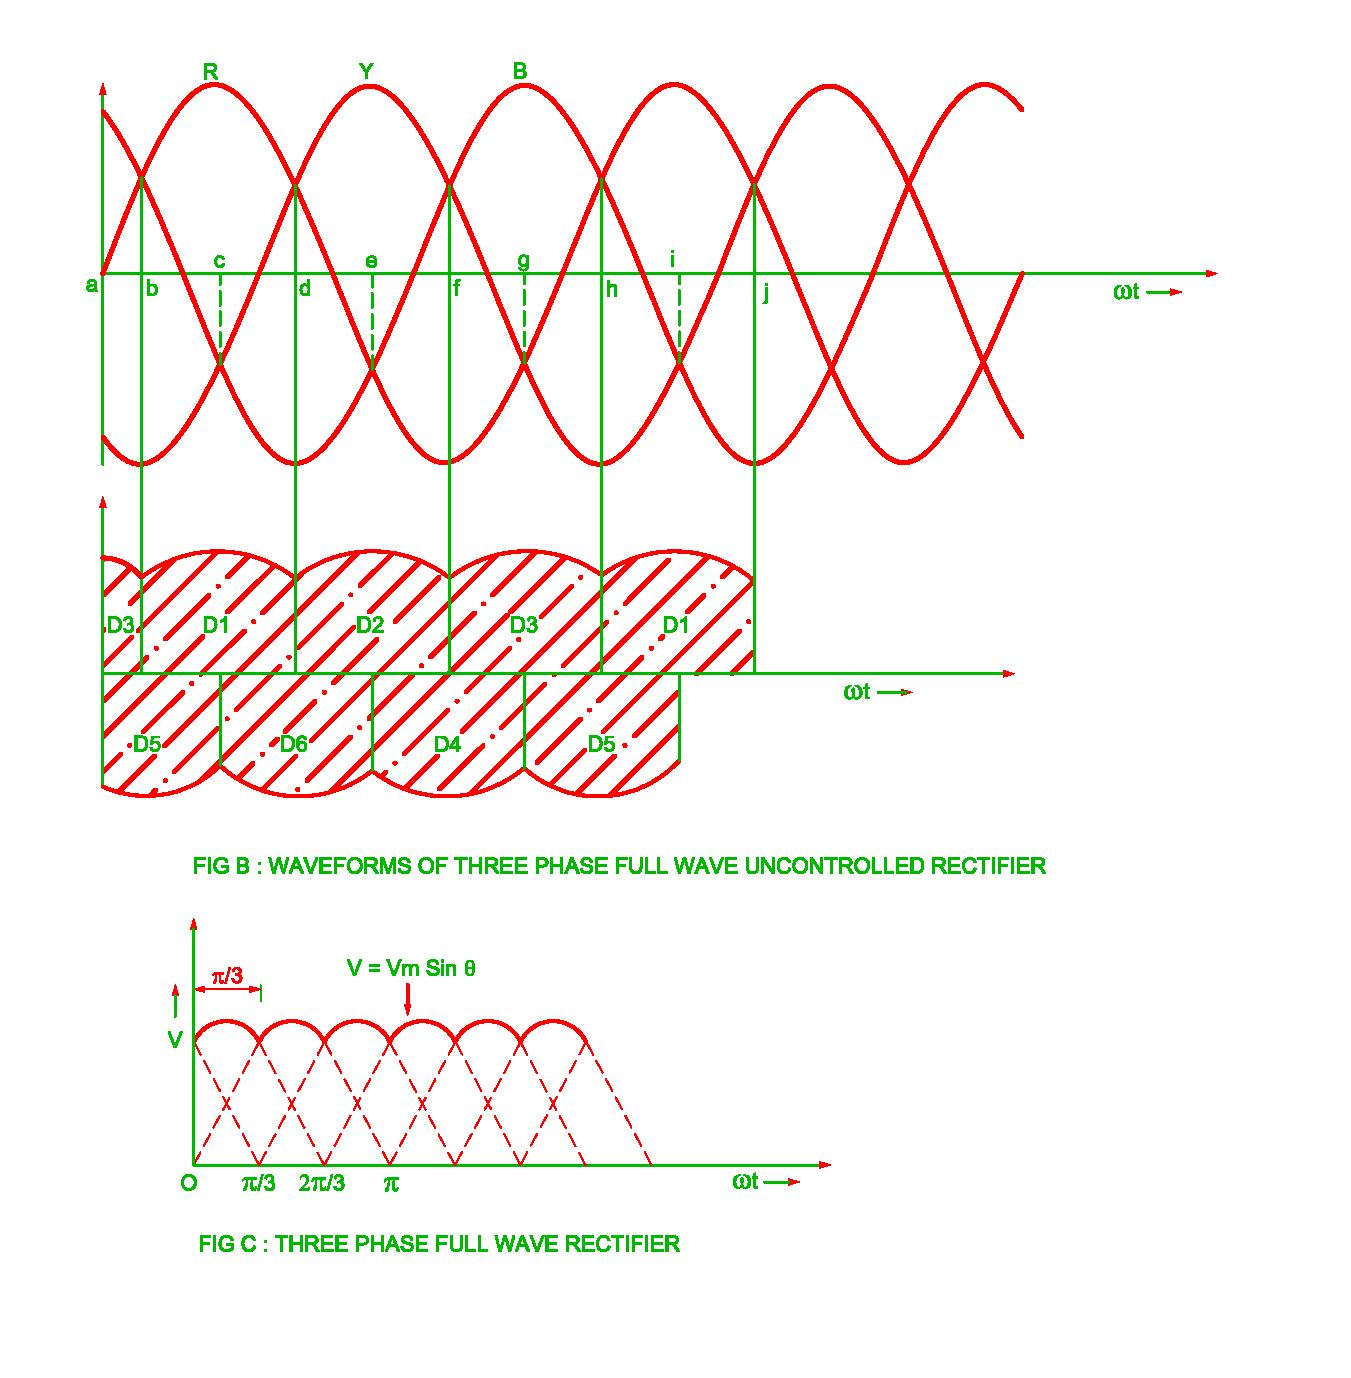 medium resolution of three phase fullwave uncontrolled waveforms jpg